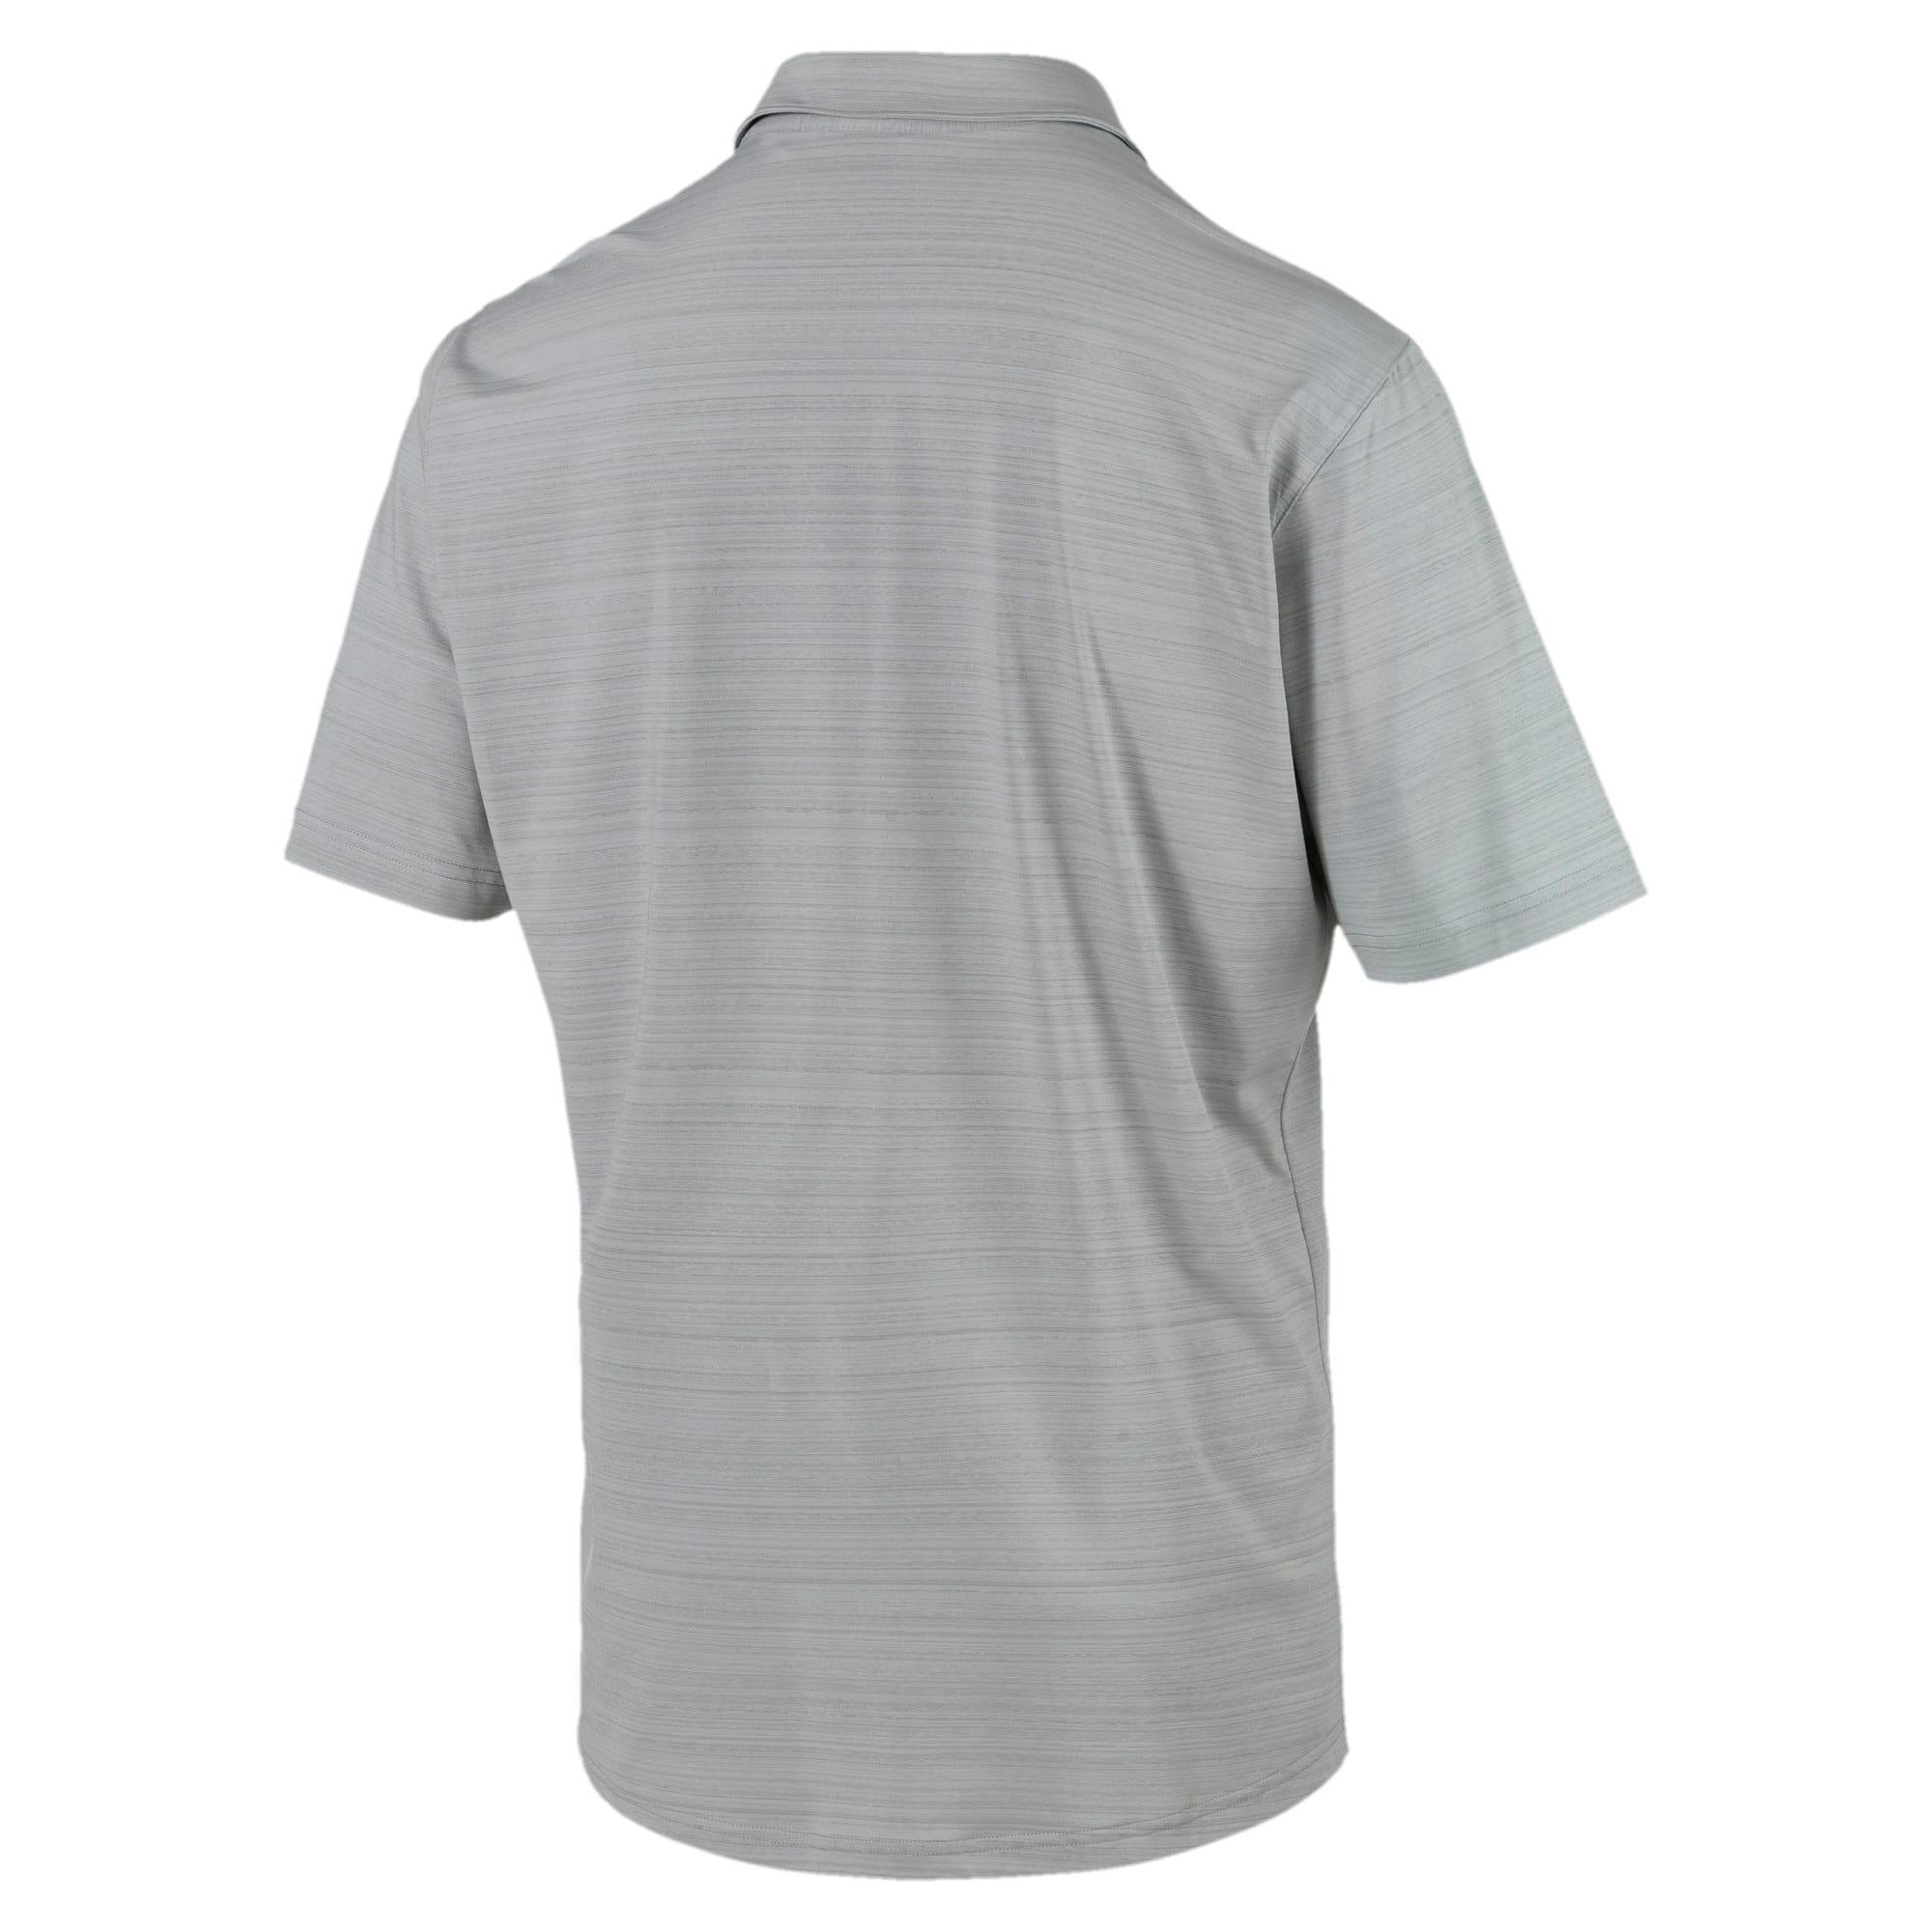 Thumbnail 5 of Breezer Short Sleeve Men's Golf Shirt, Quarry, medium-IND